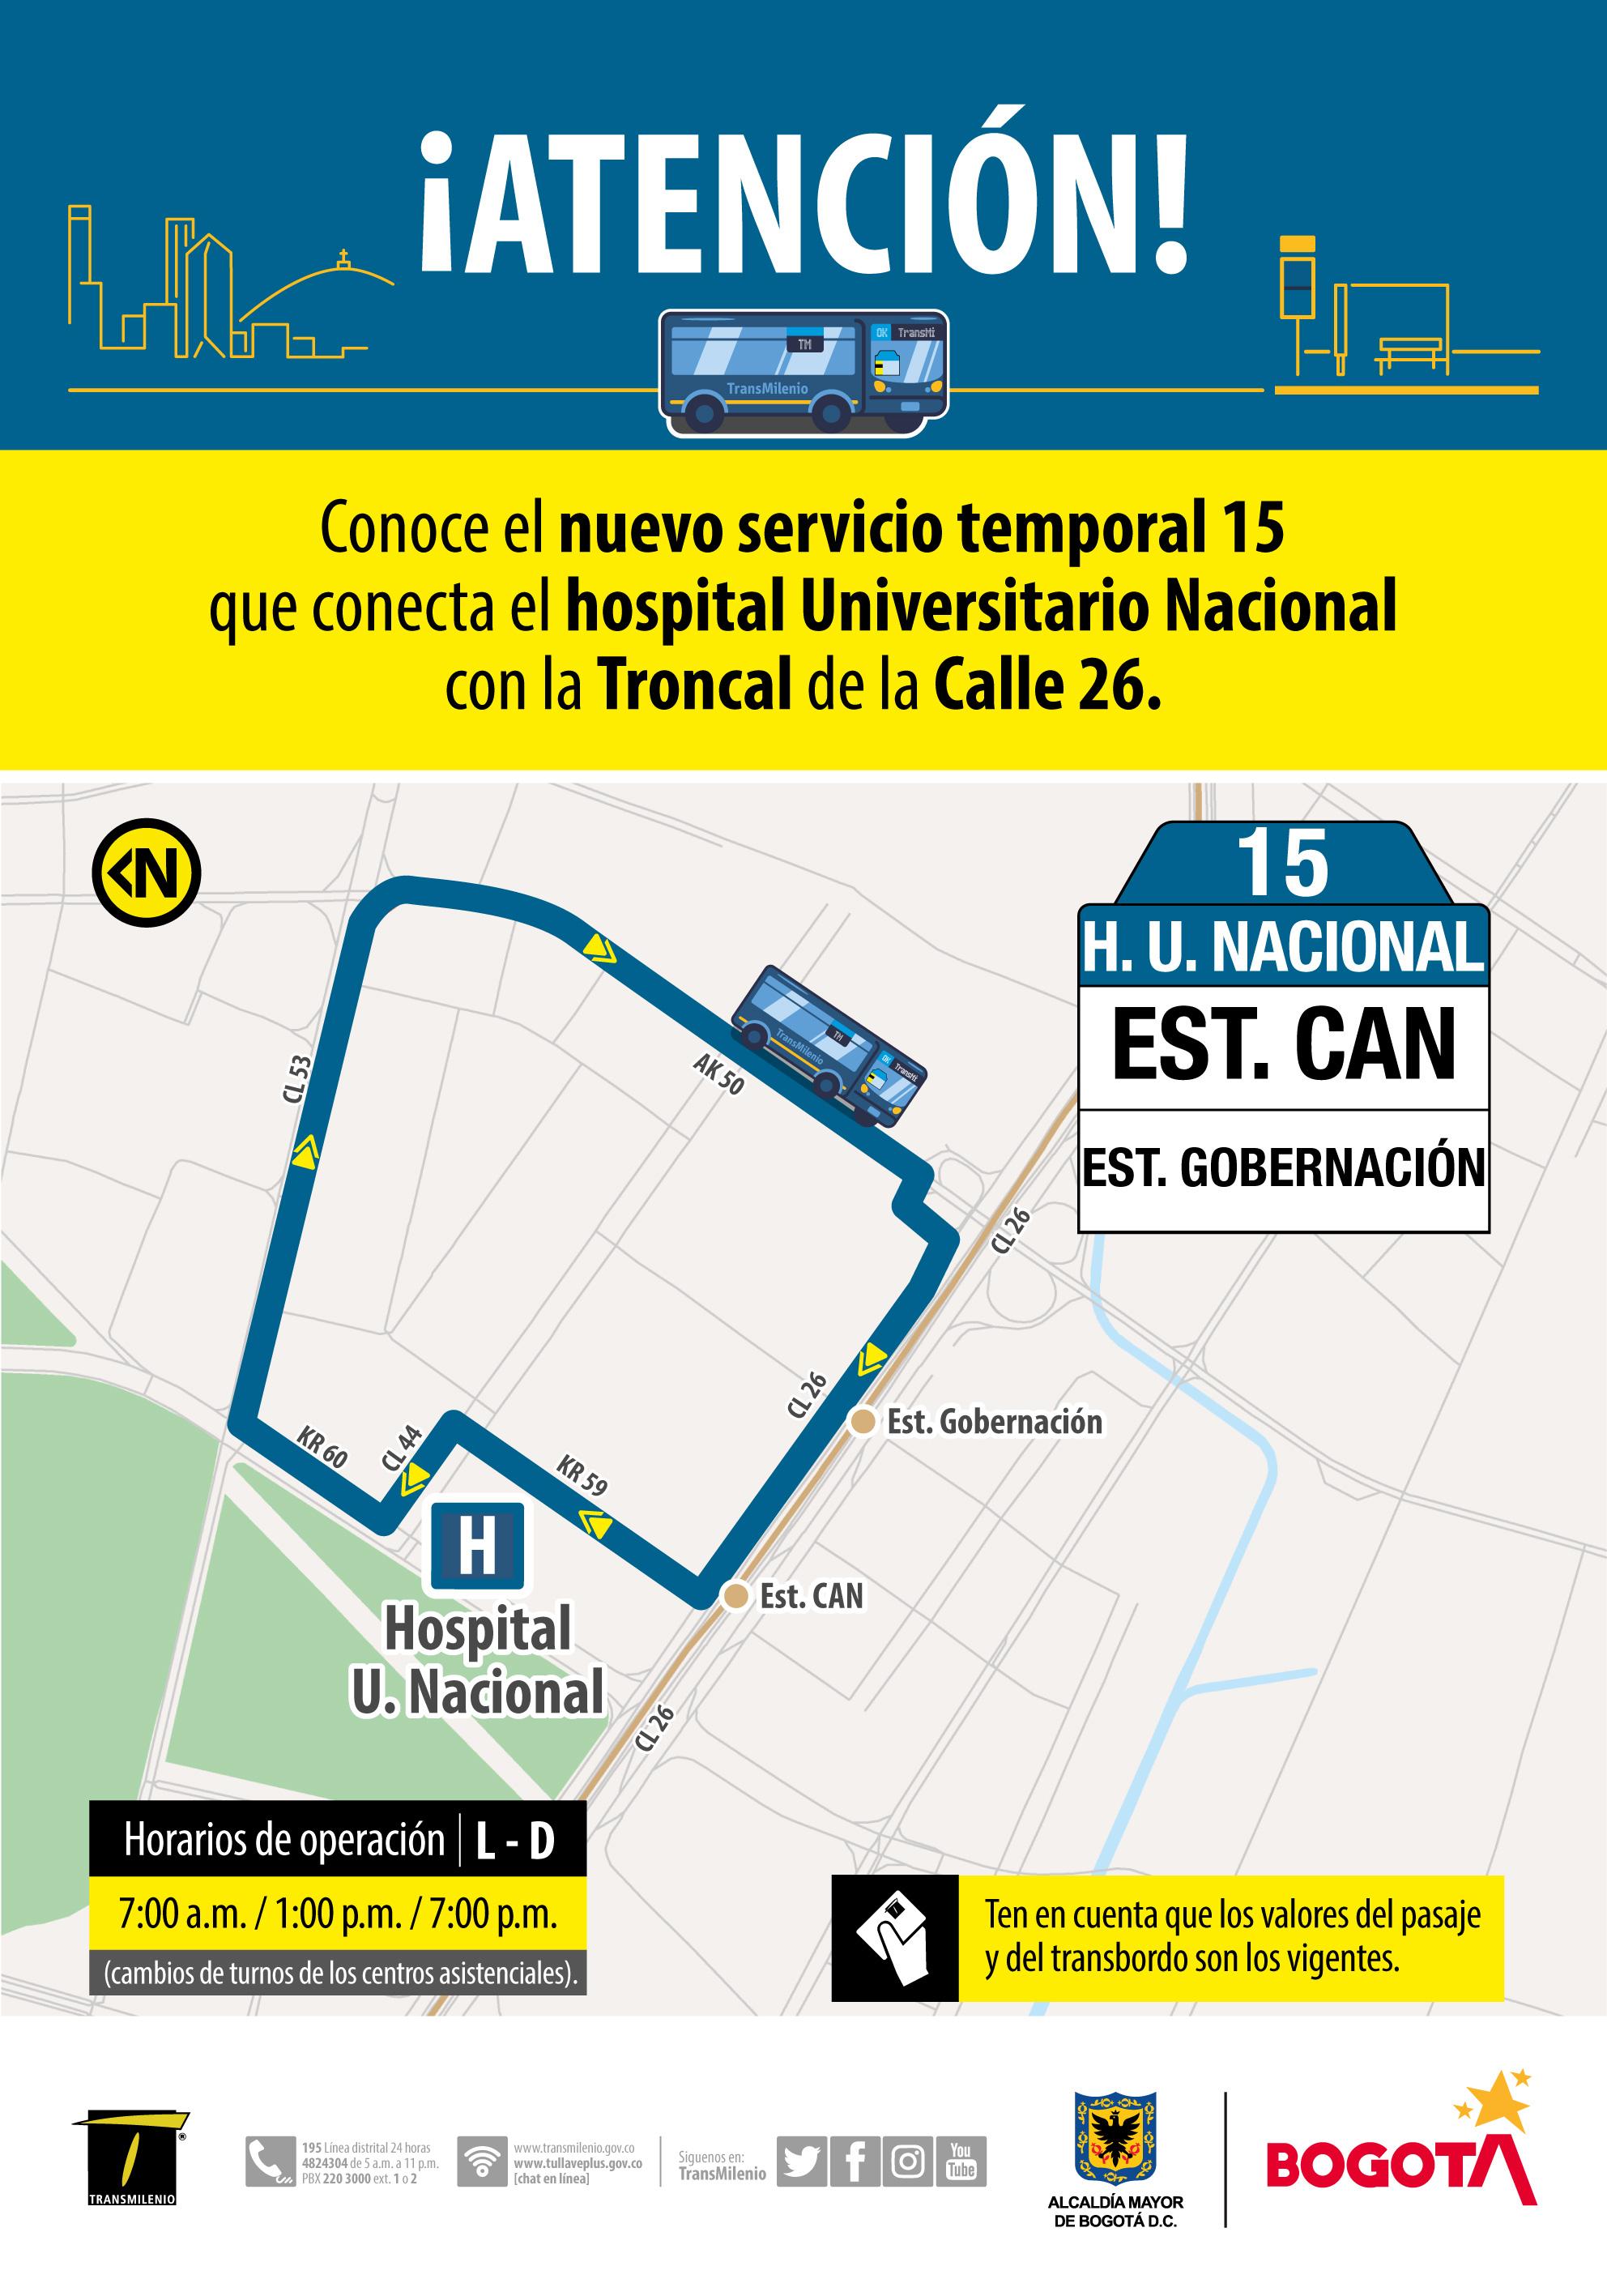 Ruta del hospital Universitario Nacional